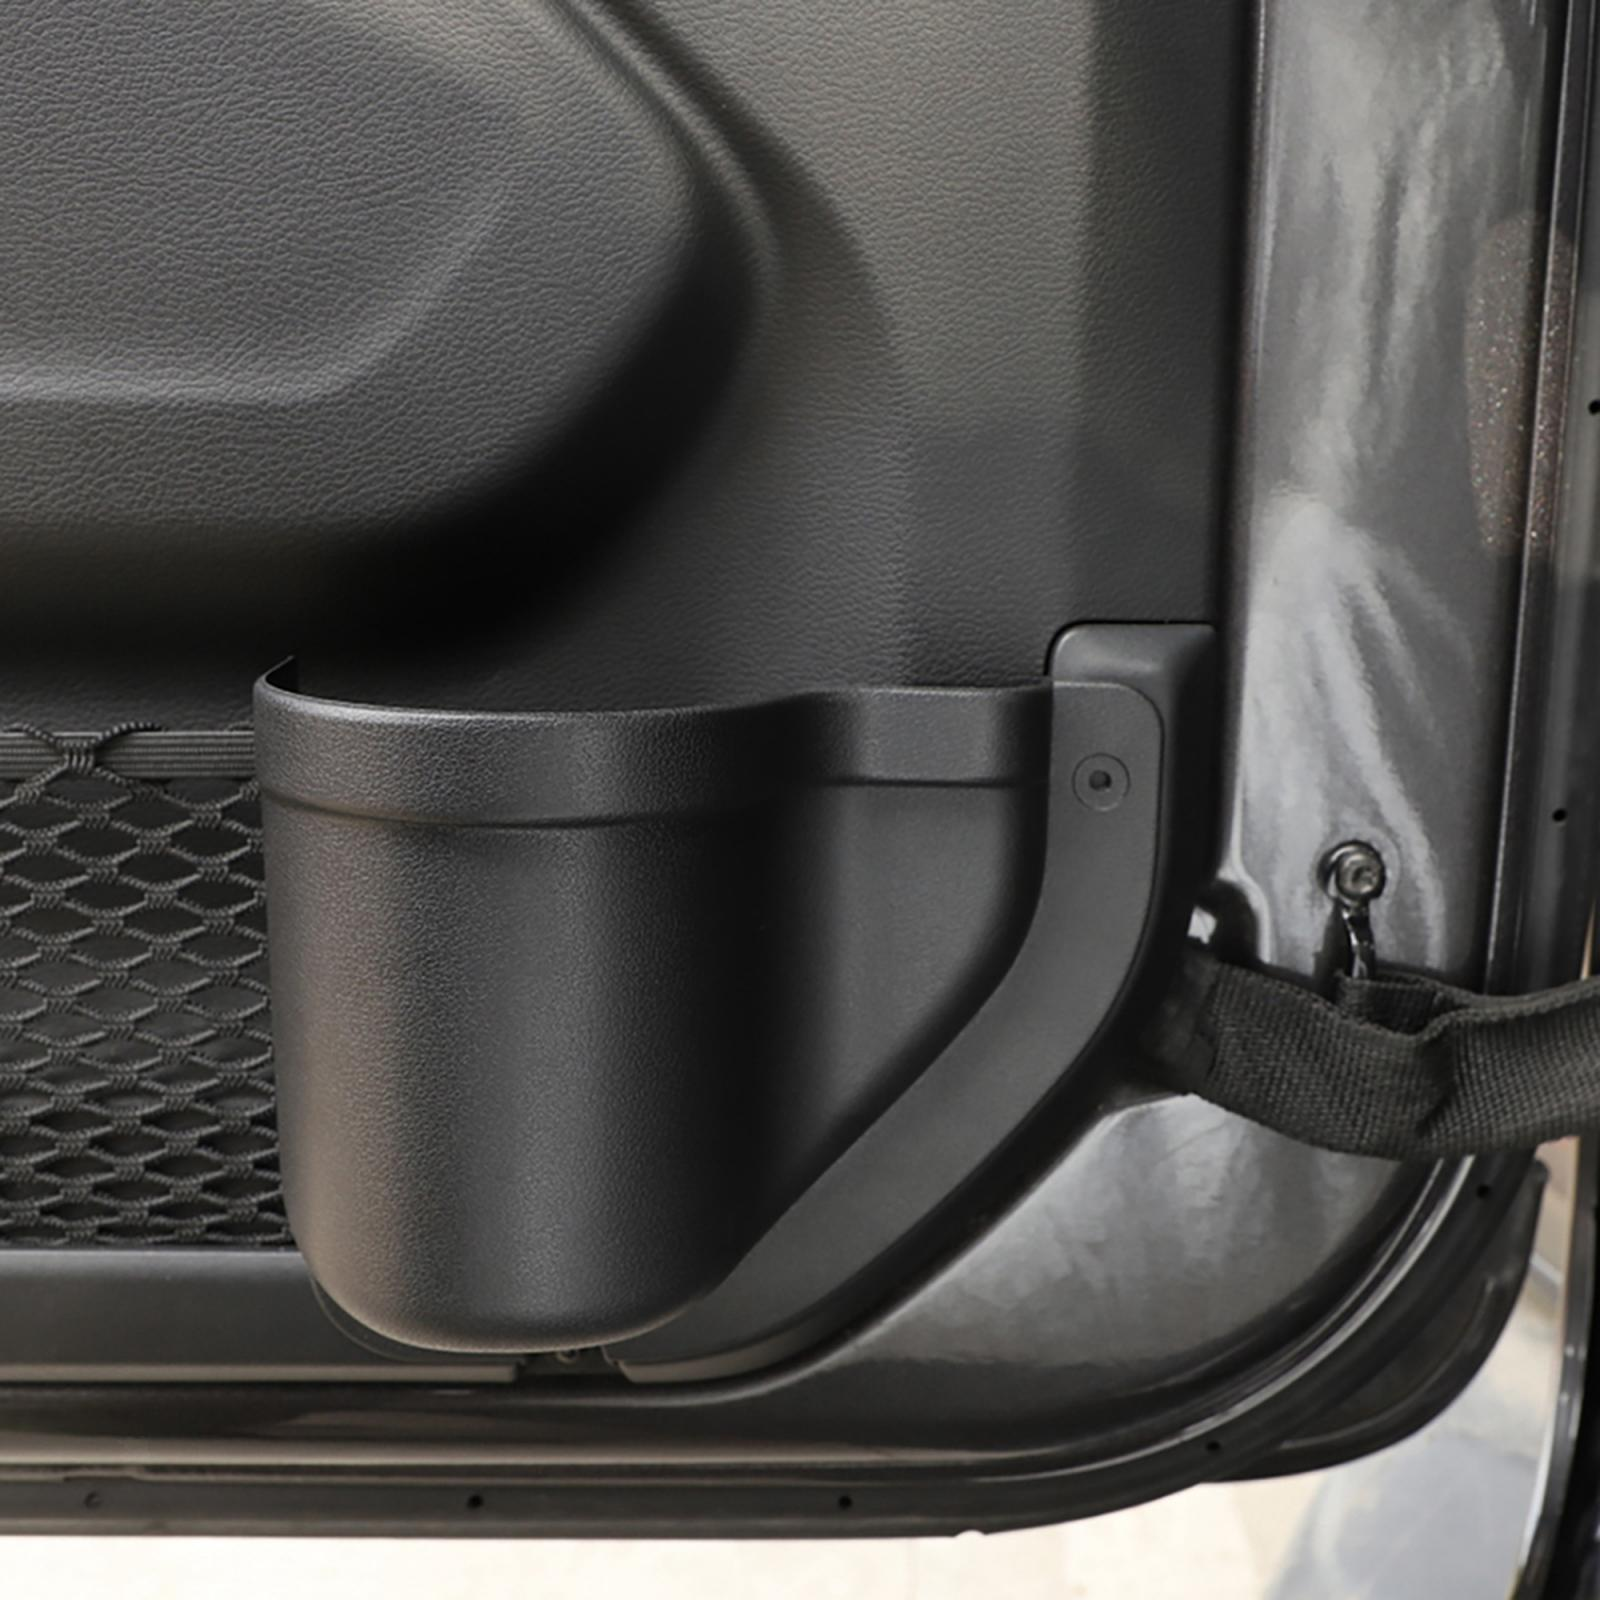 thumbnail 7 - ABS Door Storage Organizer Phone Holder for Jeep Wrangler JL 2018-2020 Black